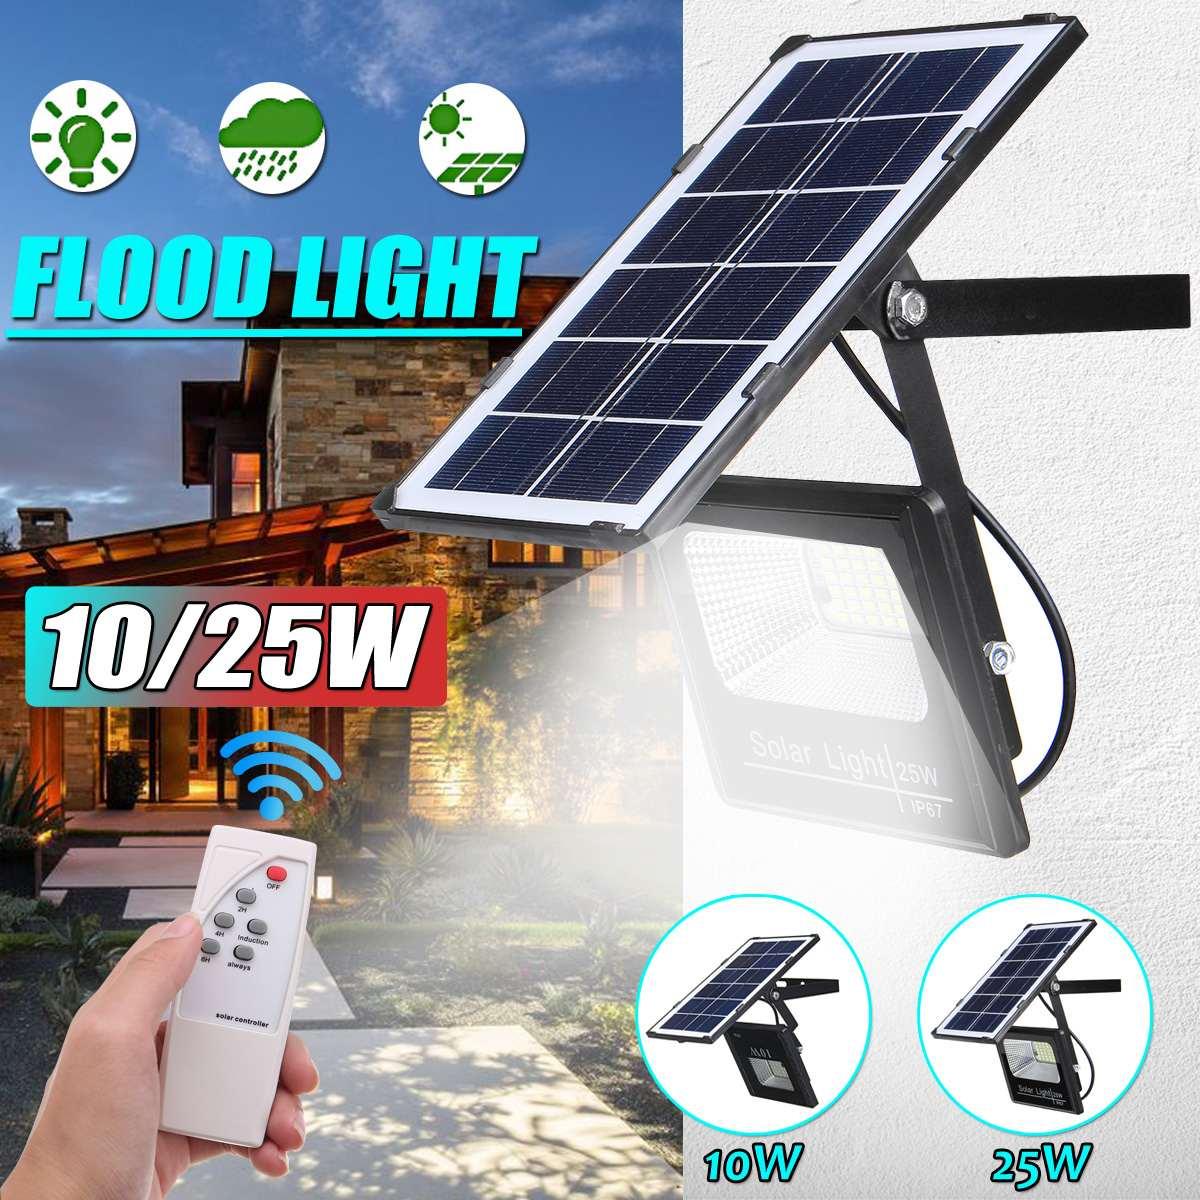 10/25W reflector Solar foco LED portátil reflector al aire libre calle Jardín luz impermeable lámpara de pared con Control remoto